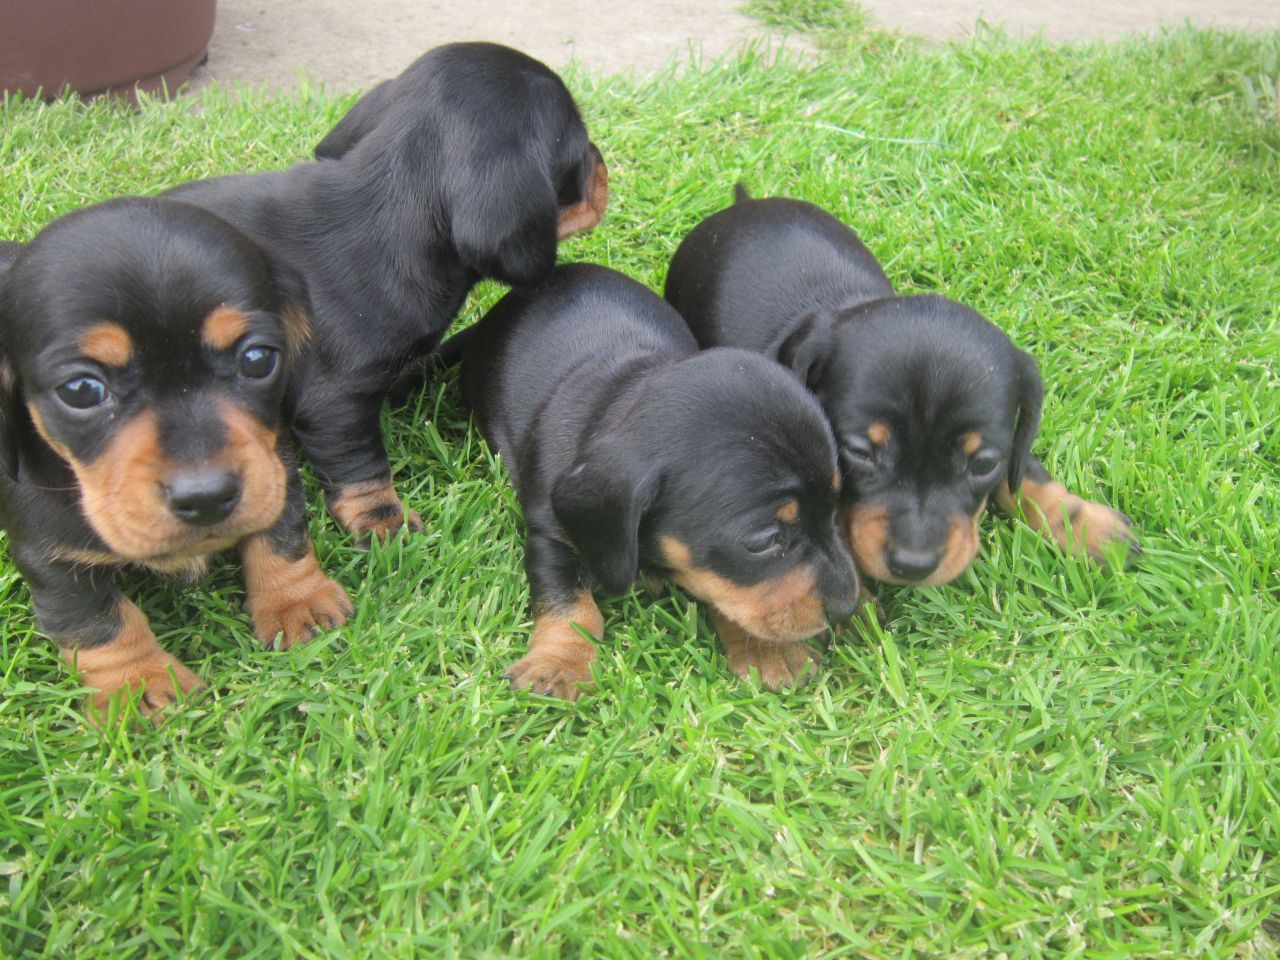 Puppies!!! Baby puppies, Dachshund puppies, Cute puppies